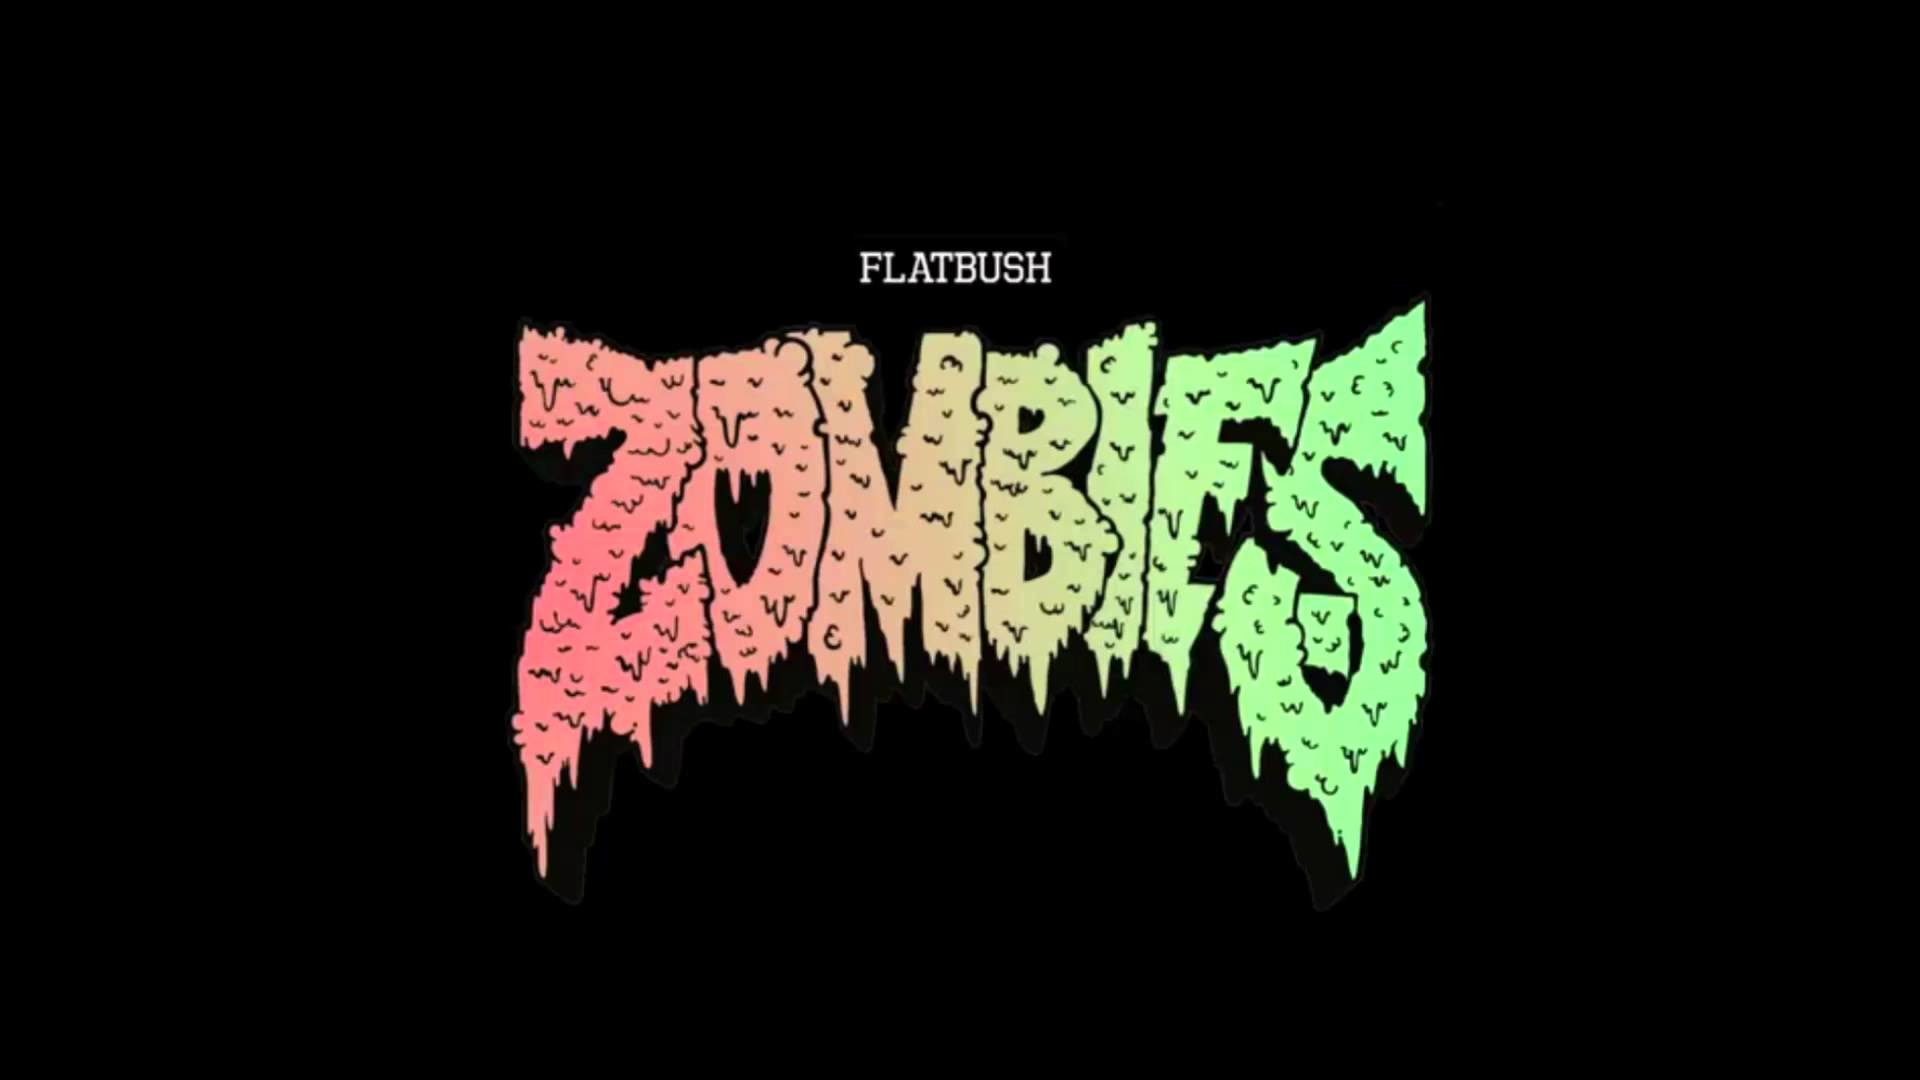 flatbush-zombies-free-wallpaper-downloads